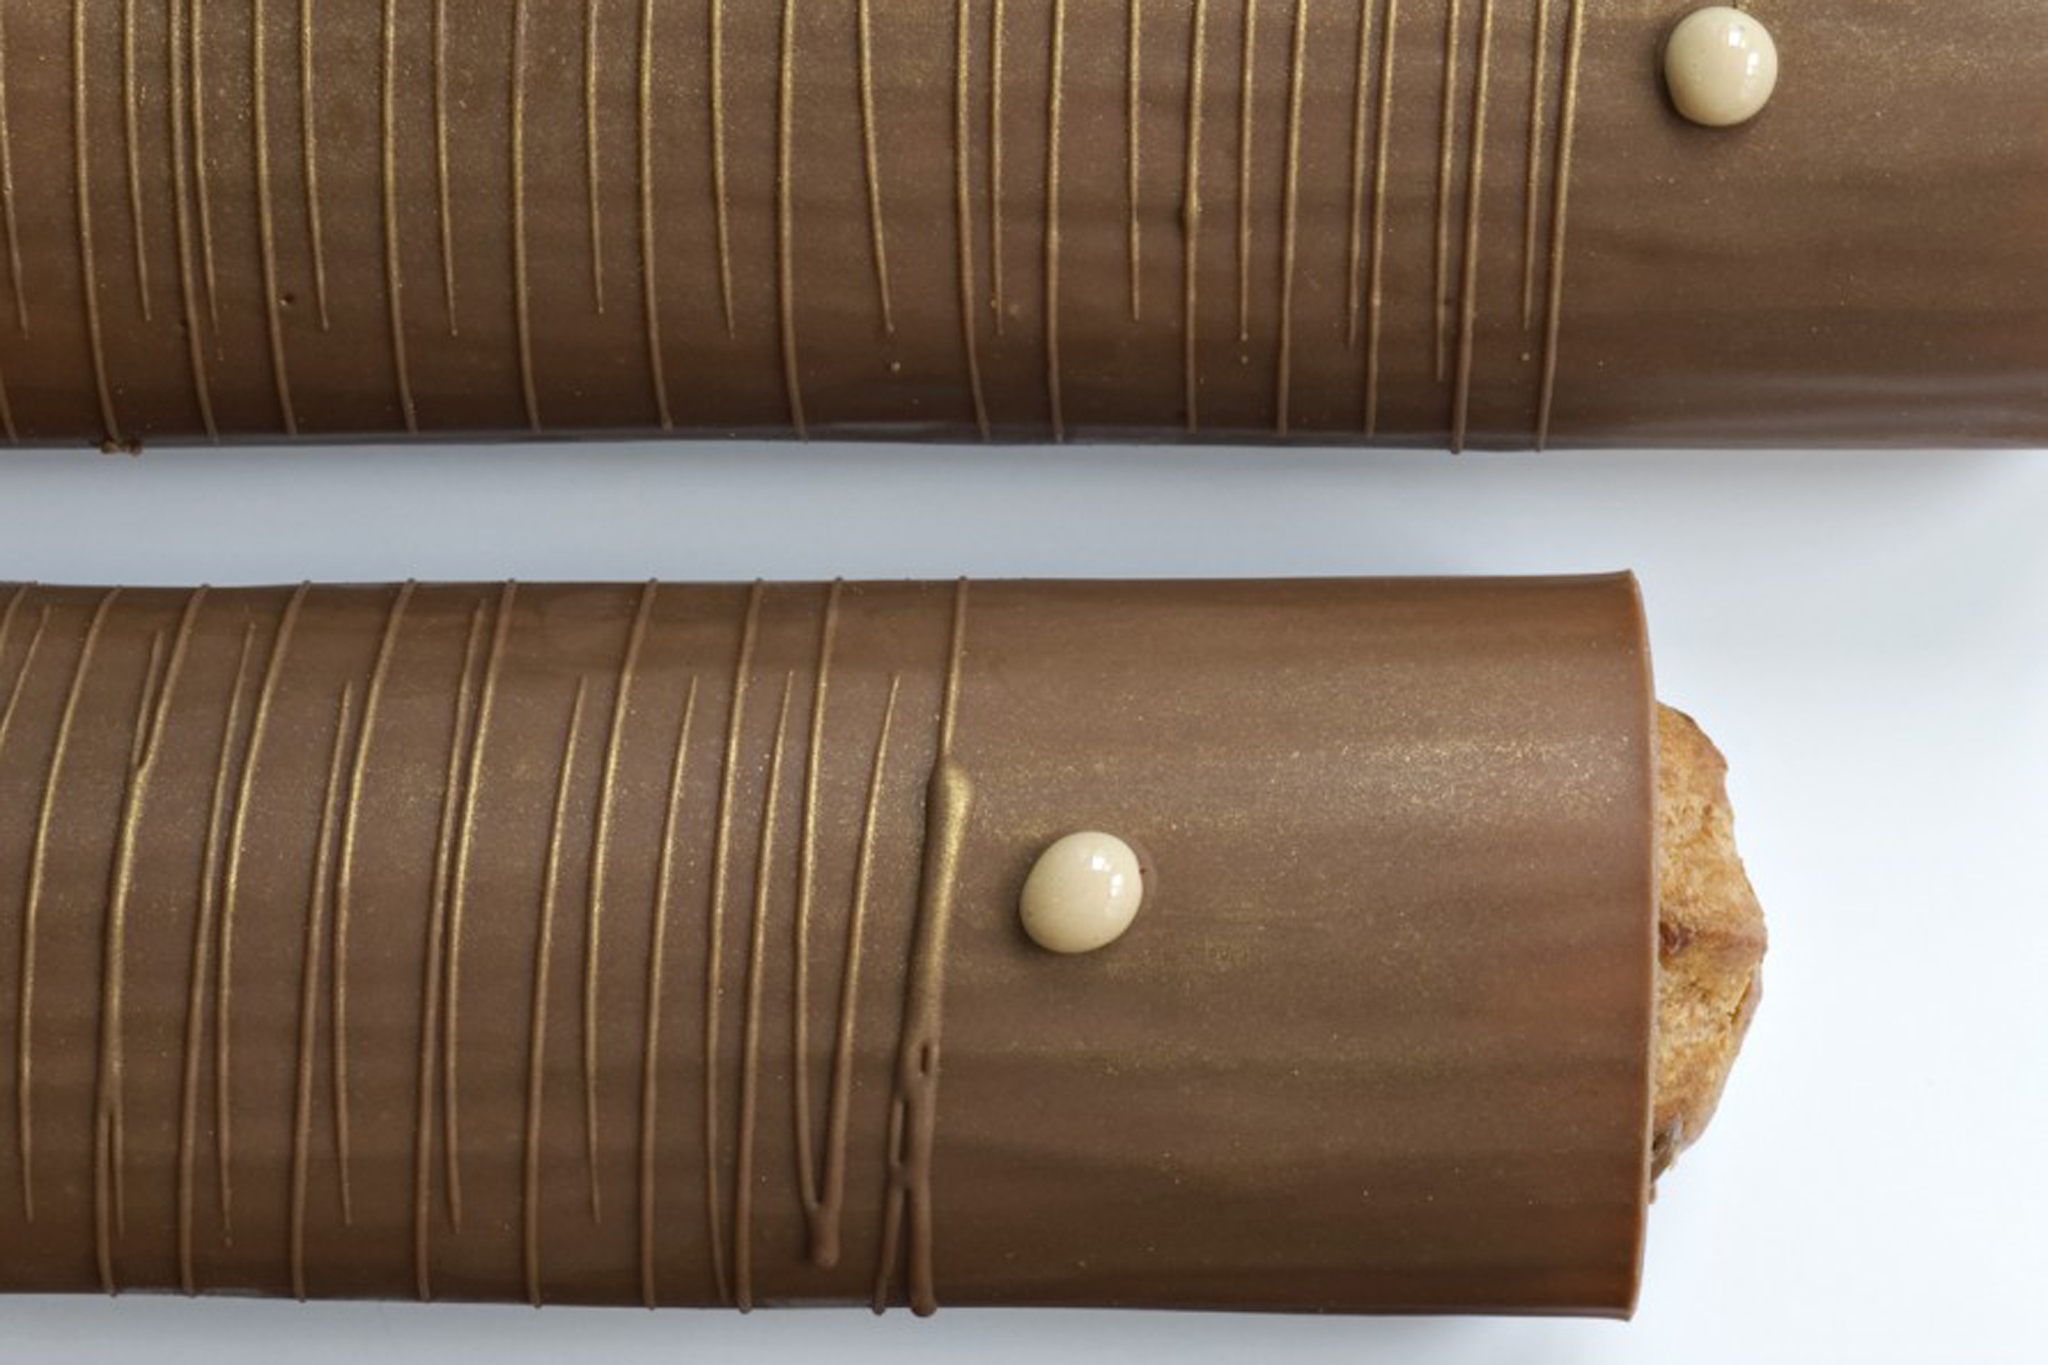 Chocolate-cloaked praline eclair at La Pâtisserie des Rêves